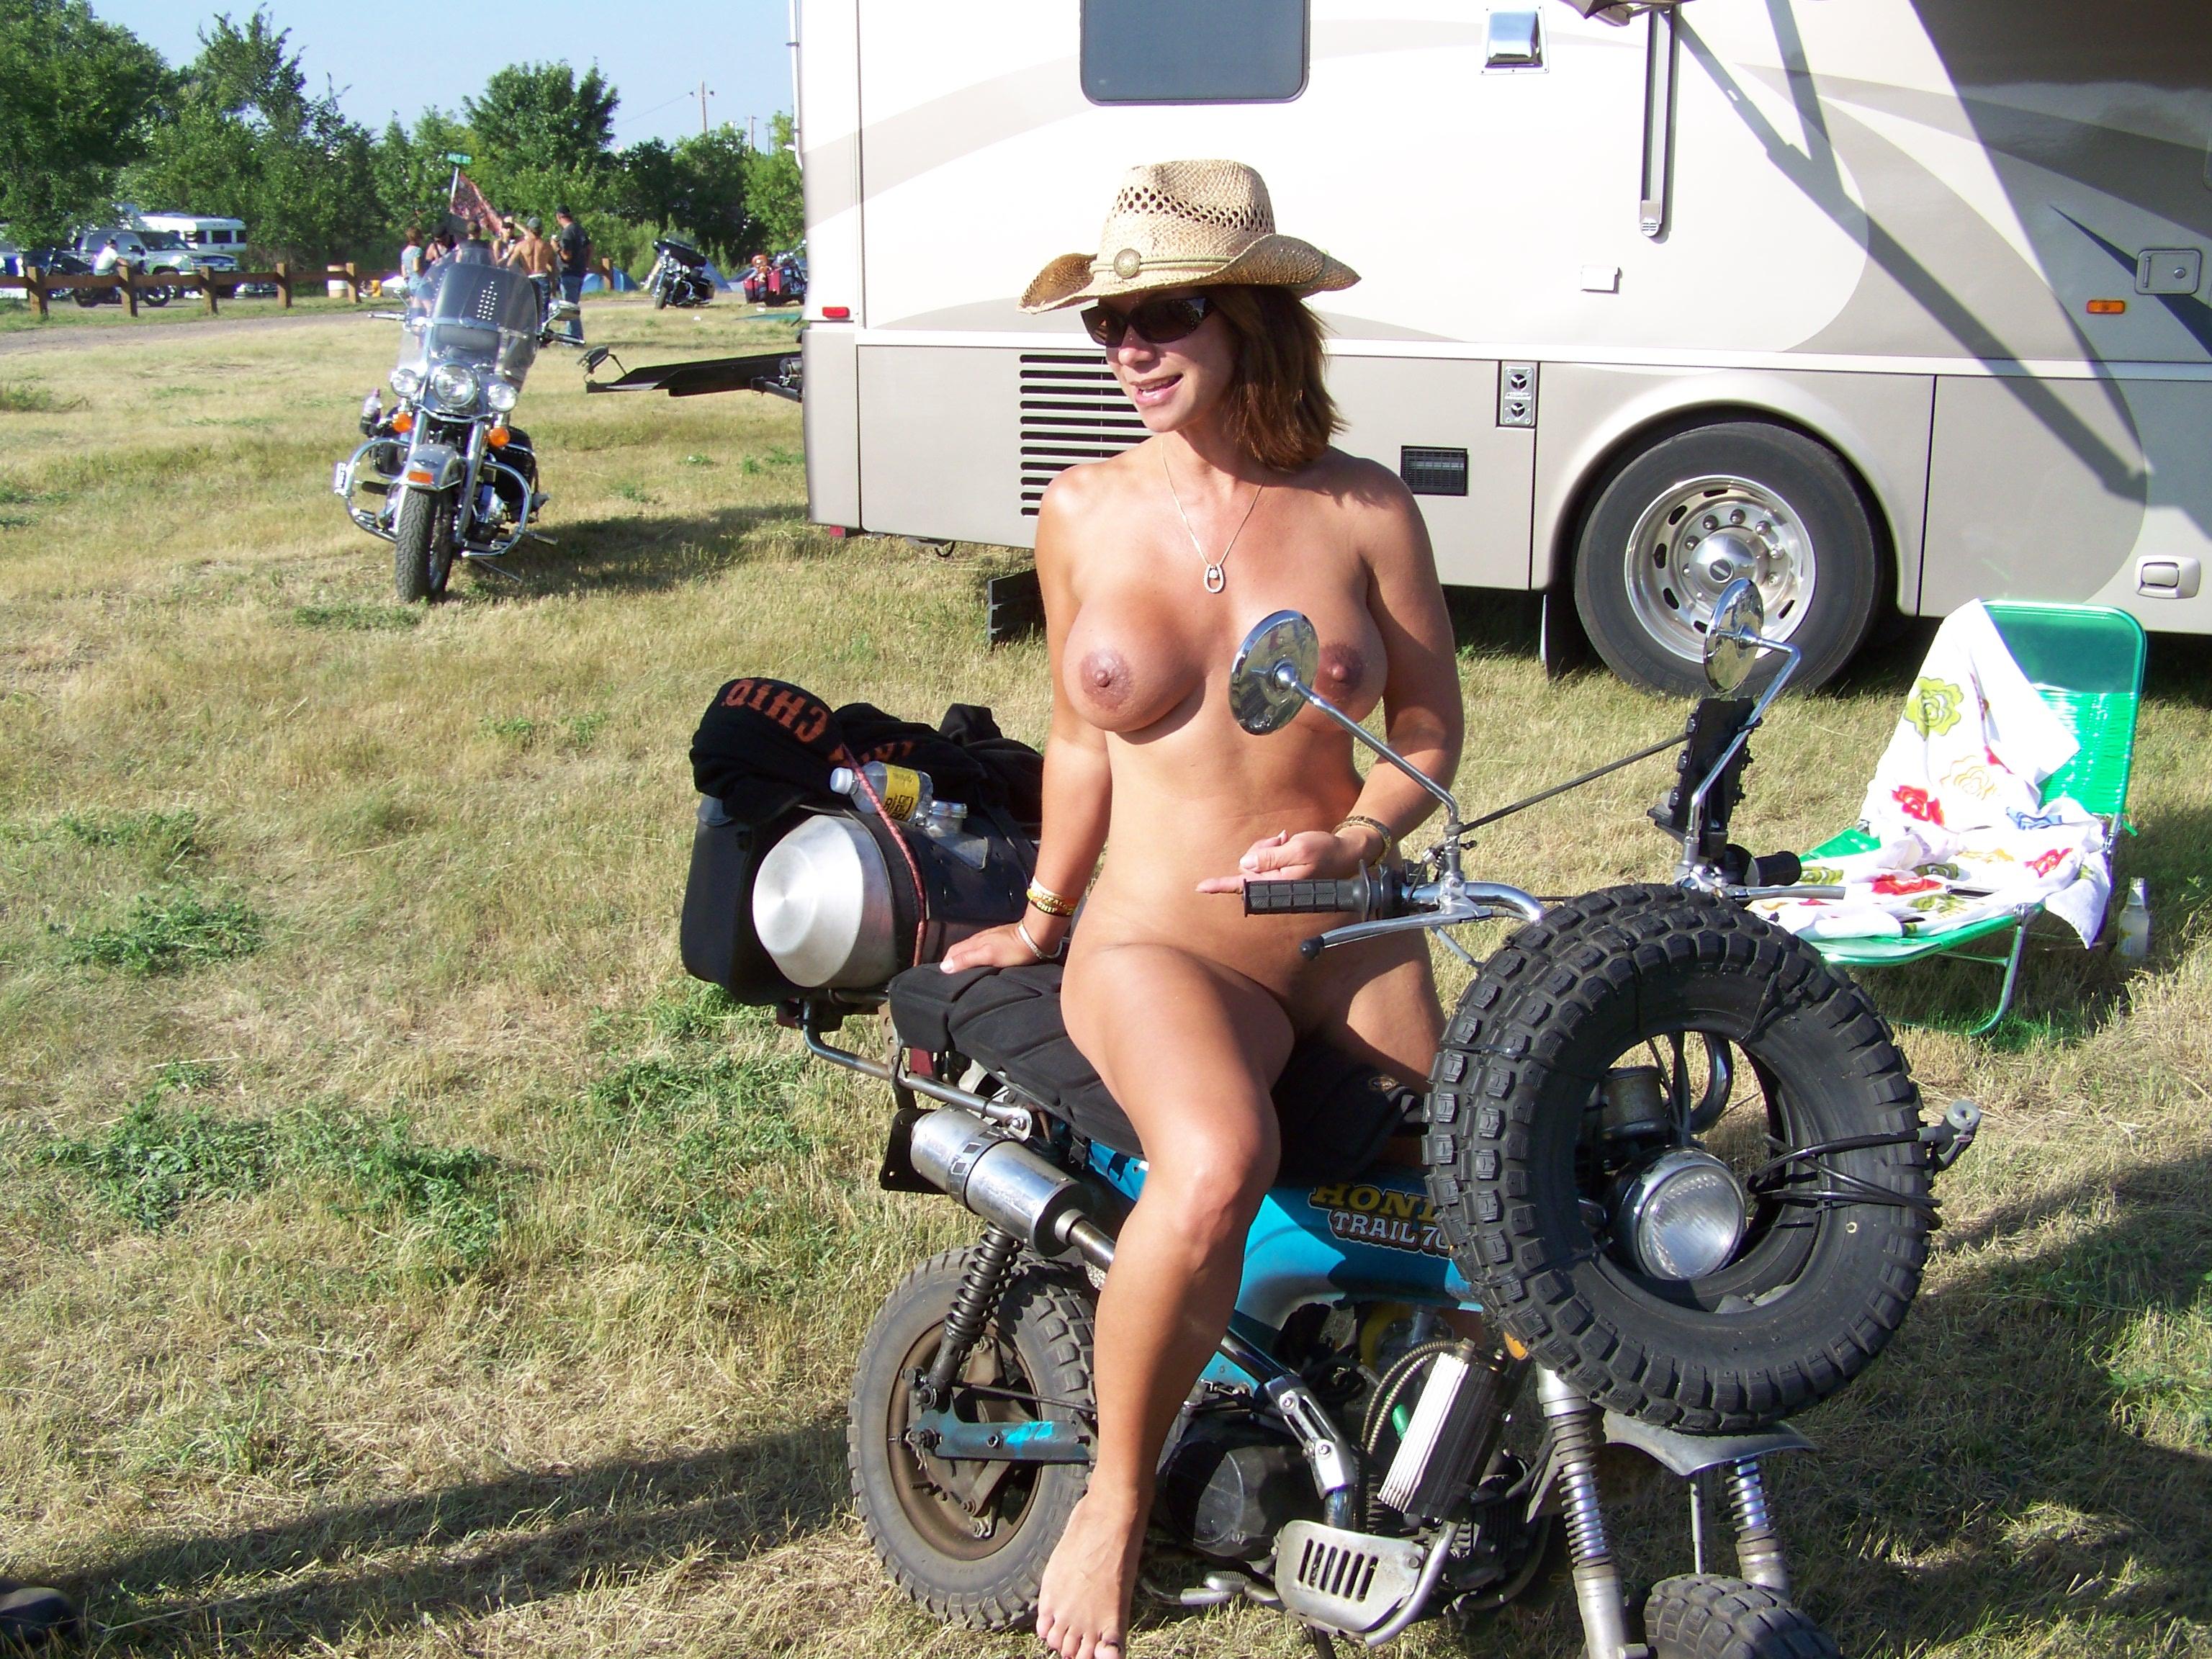 Biker Chick Pictures